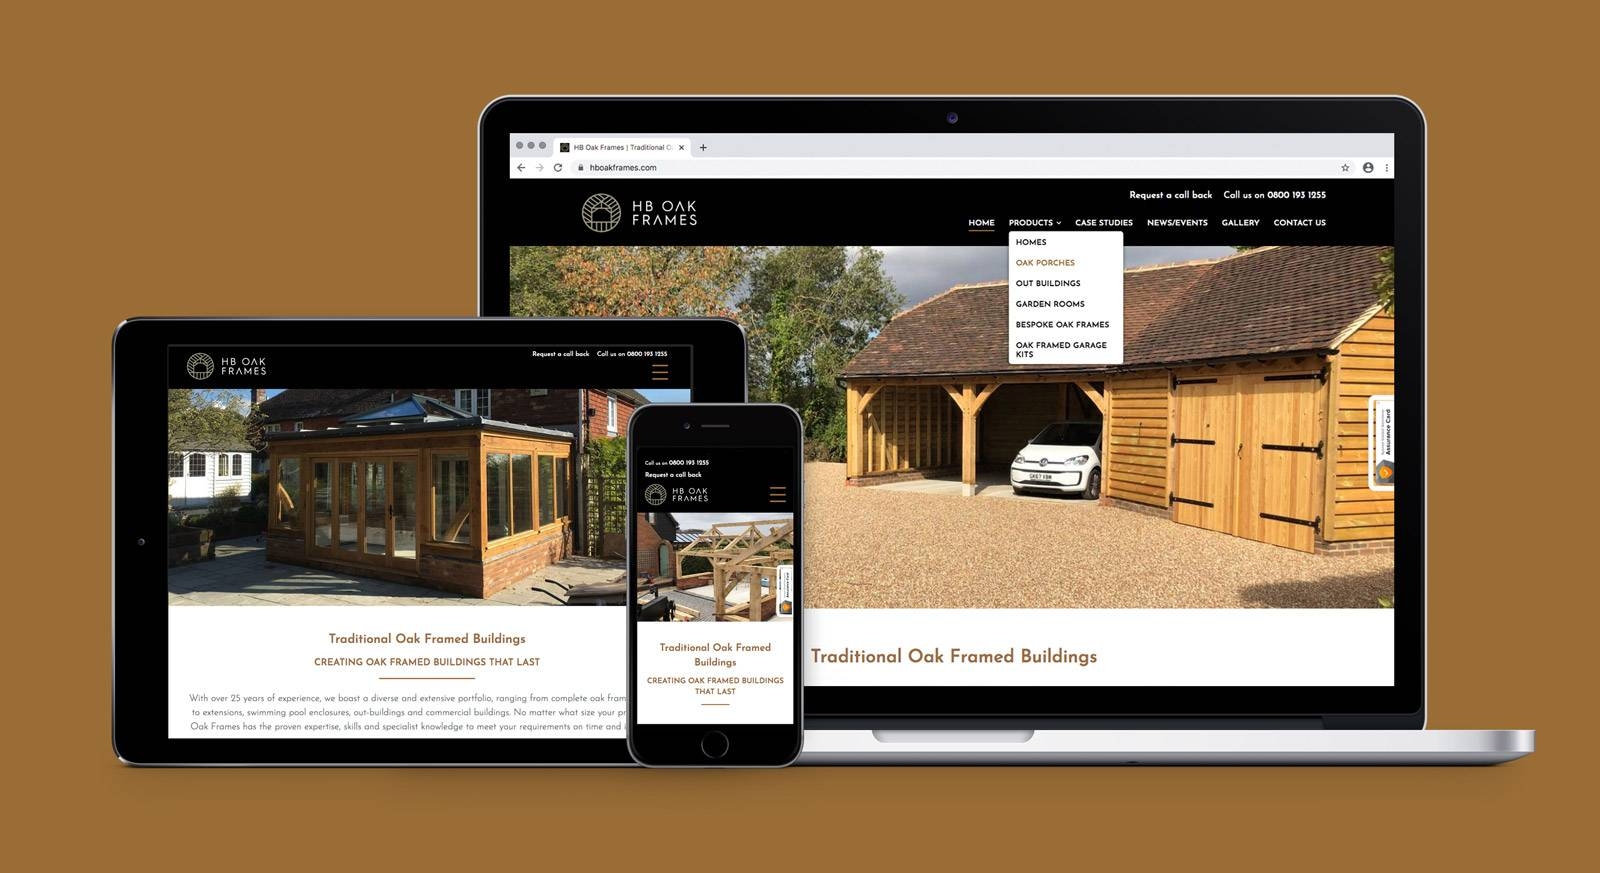 hb-oak-frames-website-corporate-identity-agency-graphic-design-canterbury.jpg